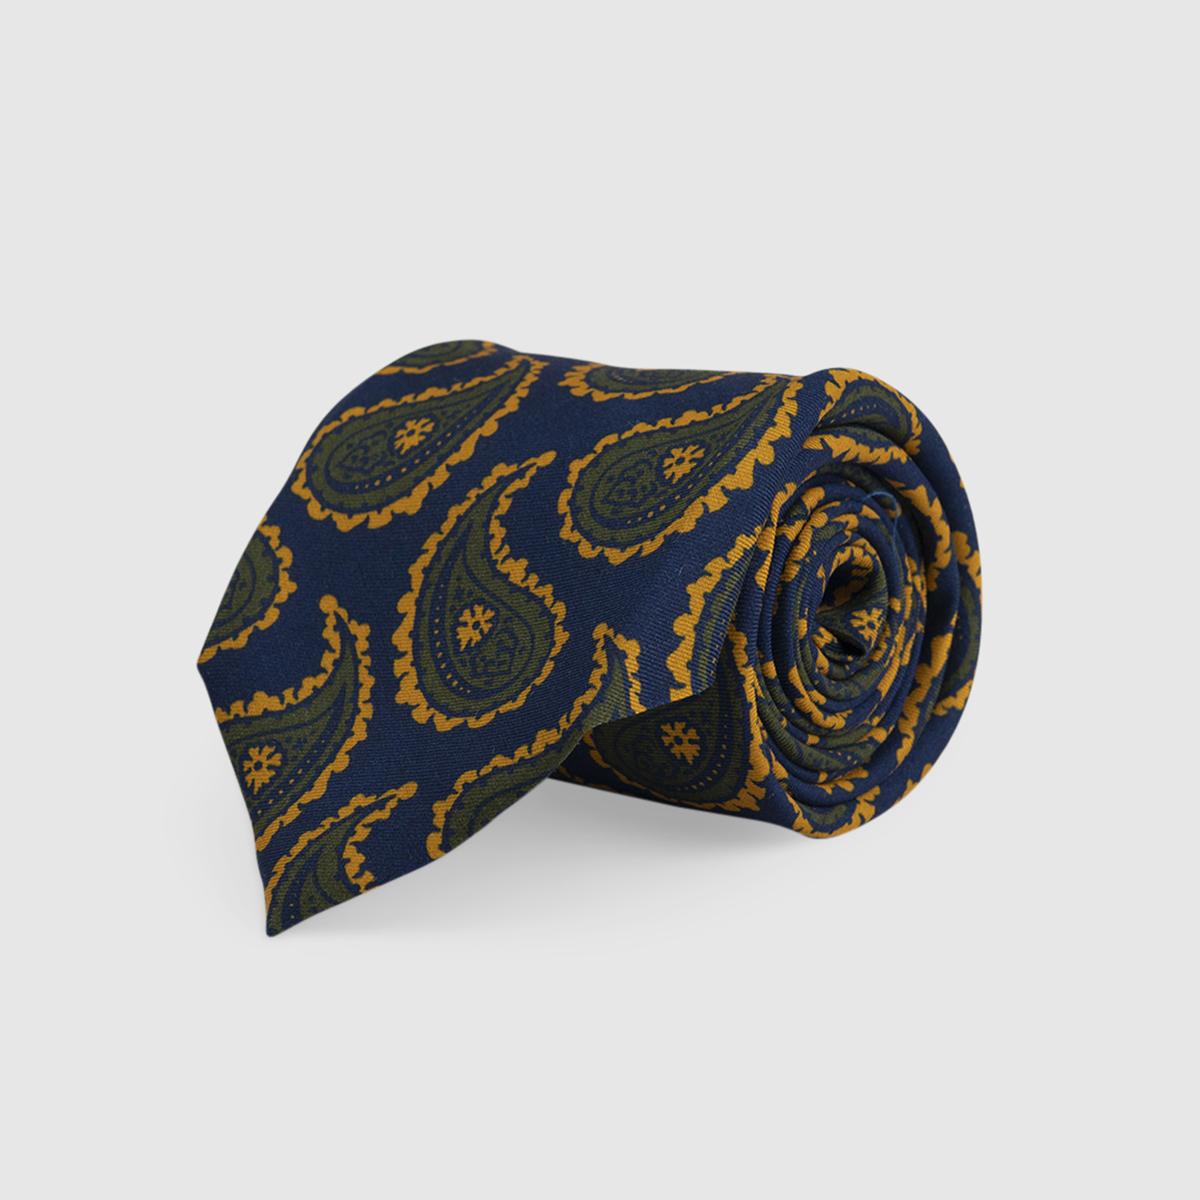 Blue 3-Fold Silk Tie with Kashmir motif